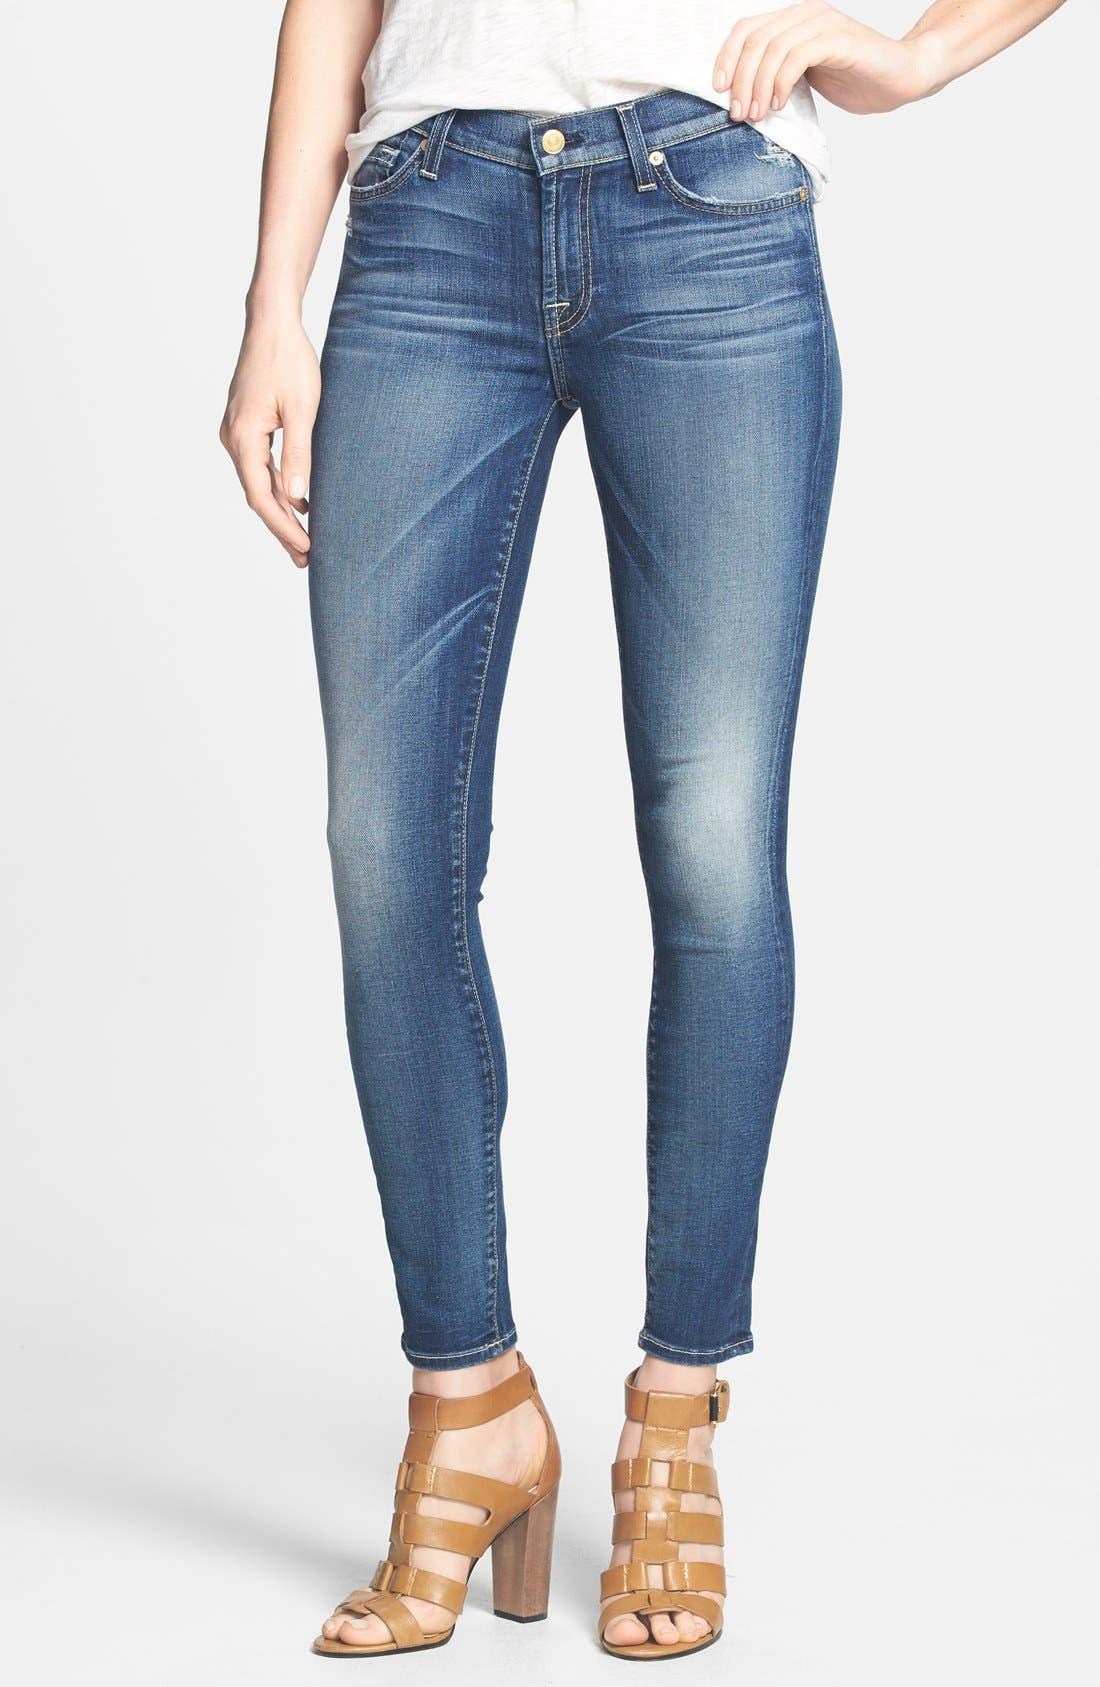 Alternate Image 1 Selected - 7 For All Mankind® Ankle Skinny Jeans (Super Grinded Blue)